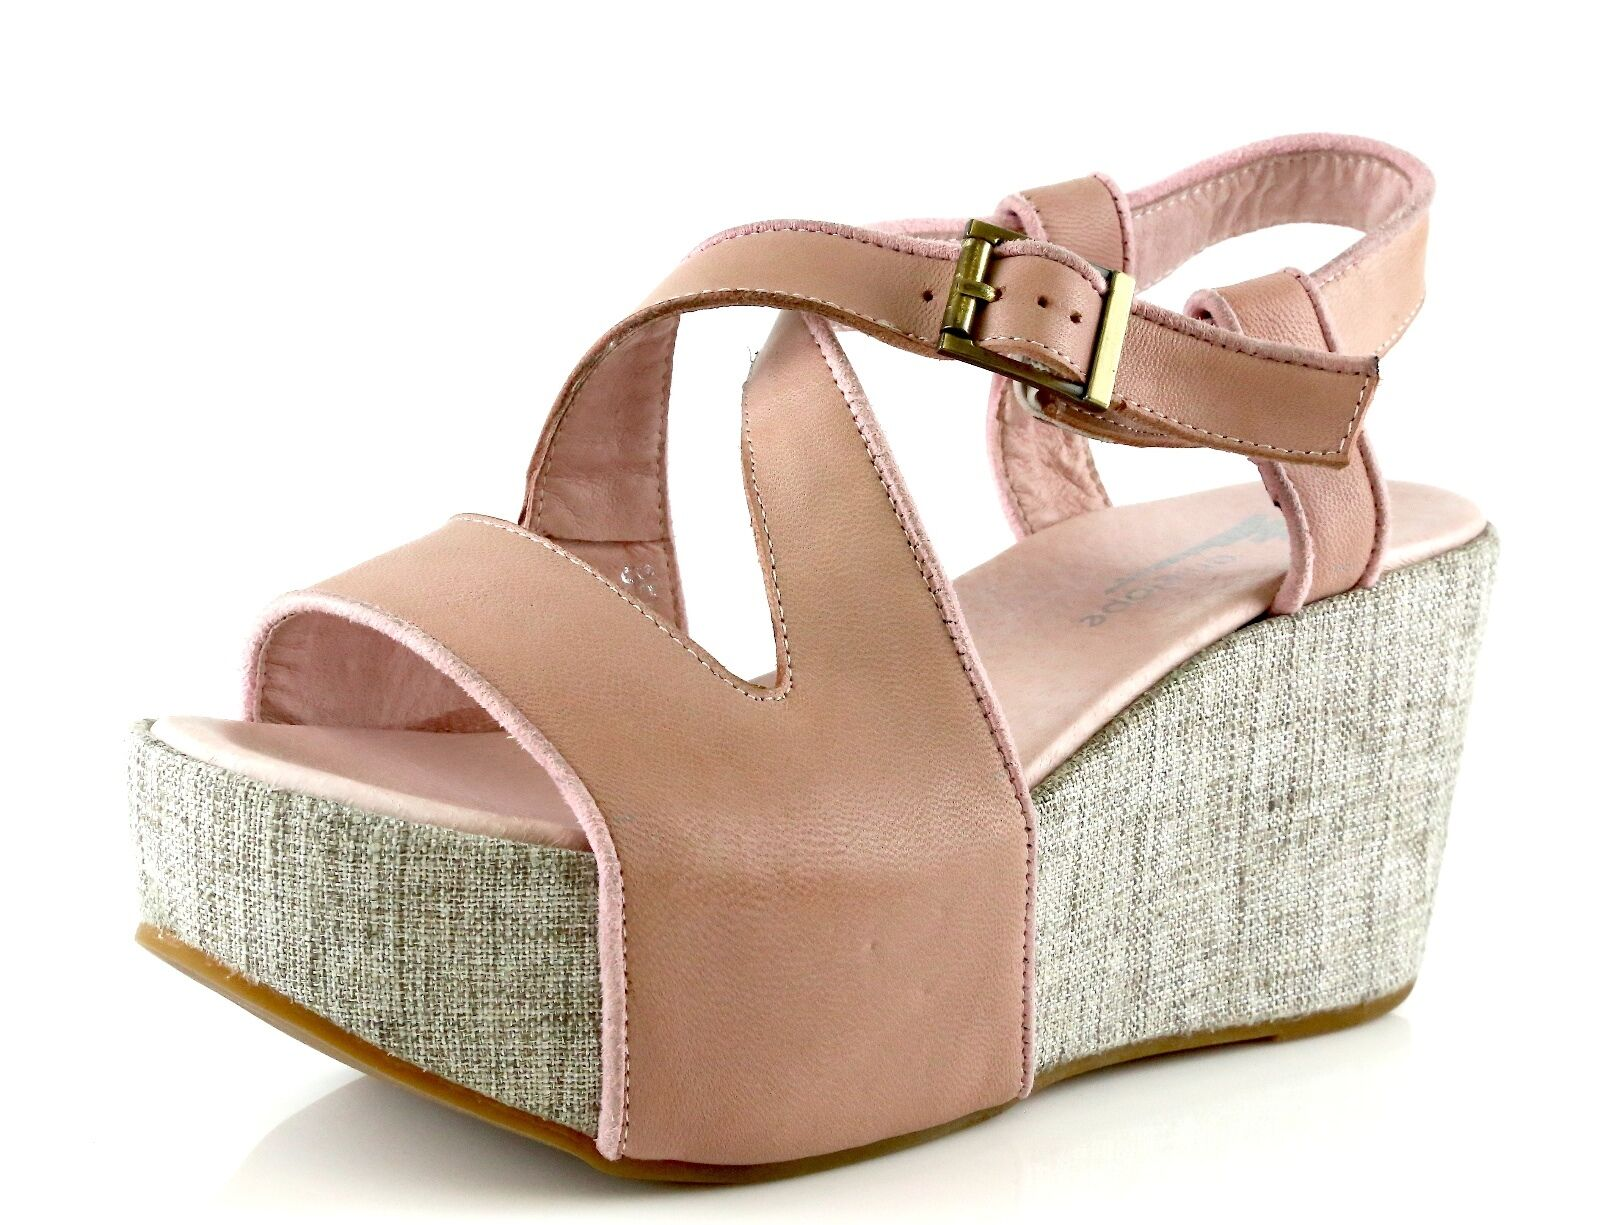 Antelope 858 Rosa Leather Wedge Sandals Sandals Sandals 7050 Größe 39 EU NEW f789df